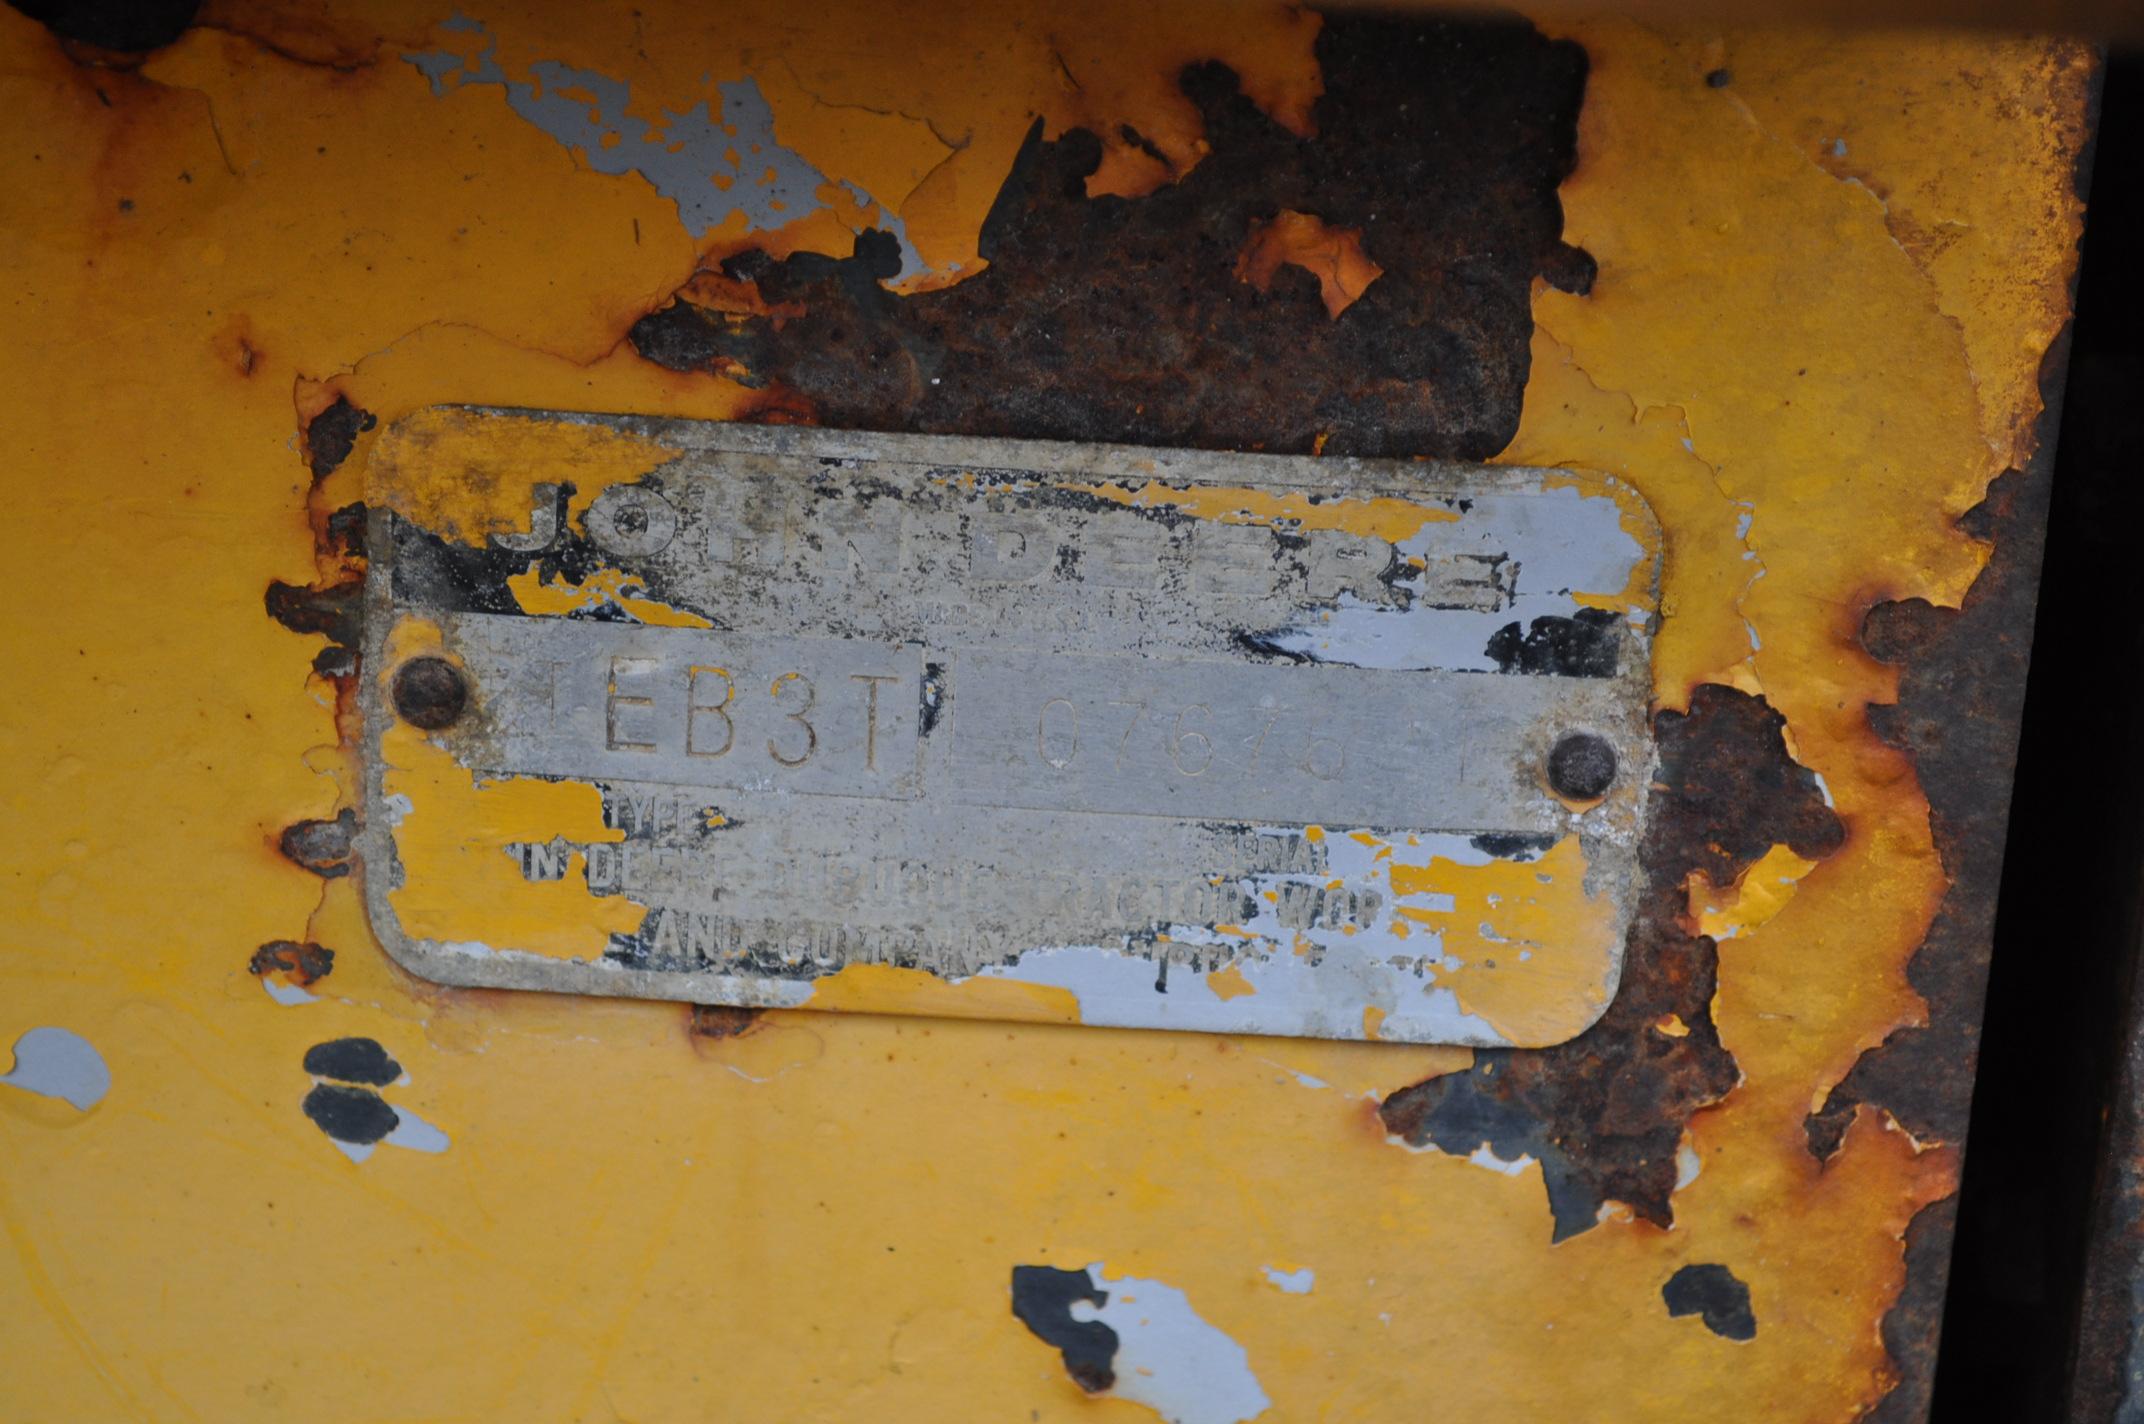 John Deere 544 Payloader, 17.5-25 tires, shows 1074 hrs, SN 0767621 - Image 10 of 16